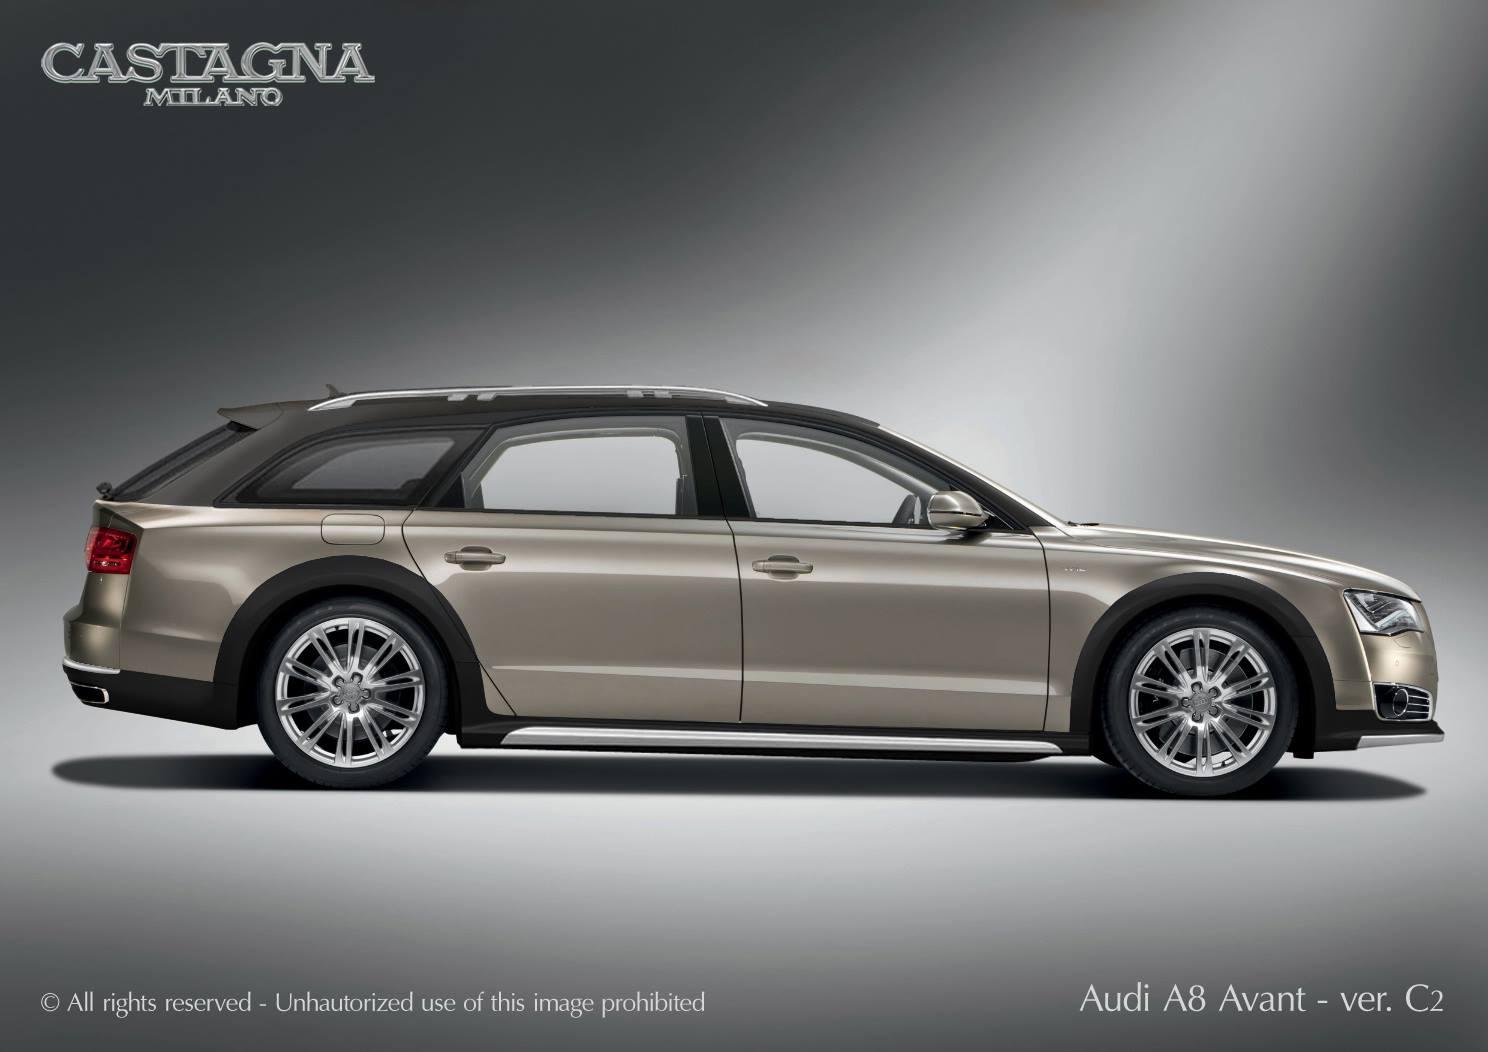 Italian Coachbuilder Shares A8 Avant Design